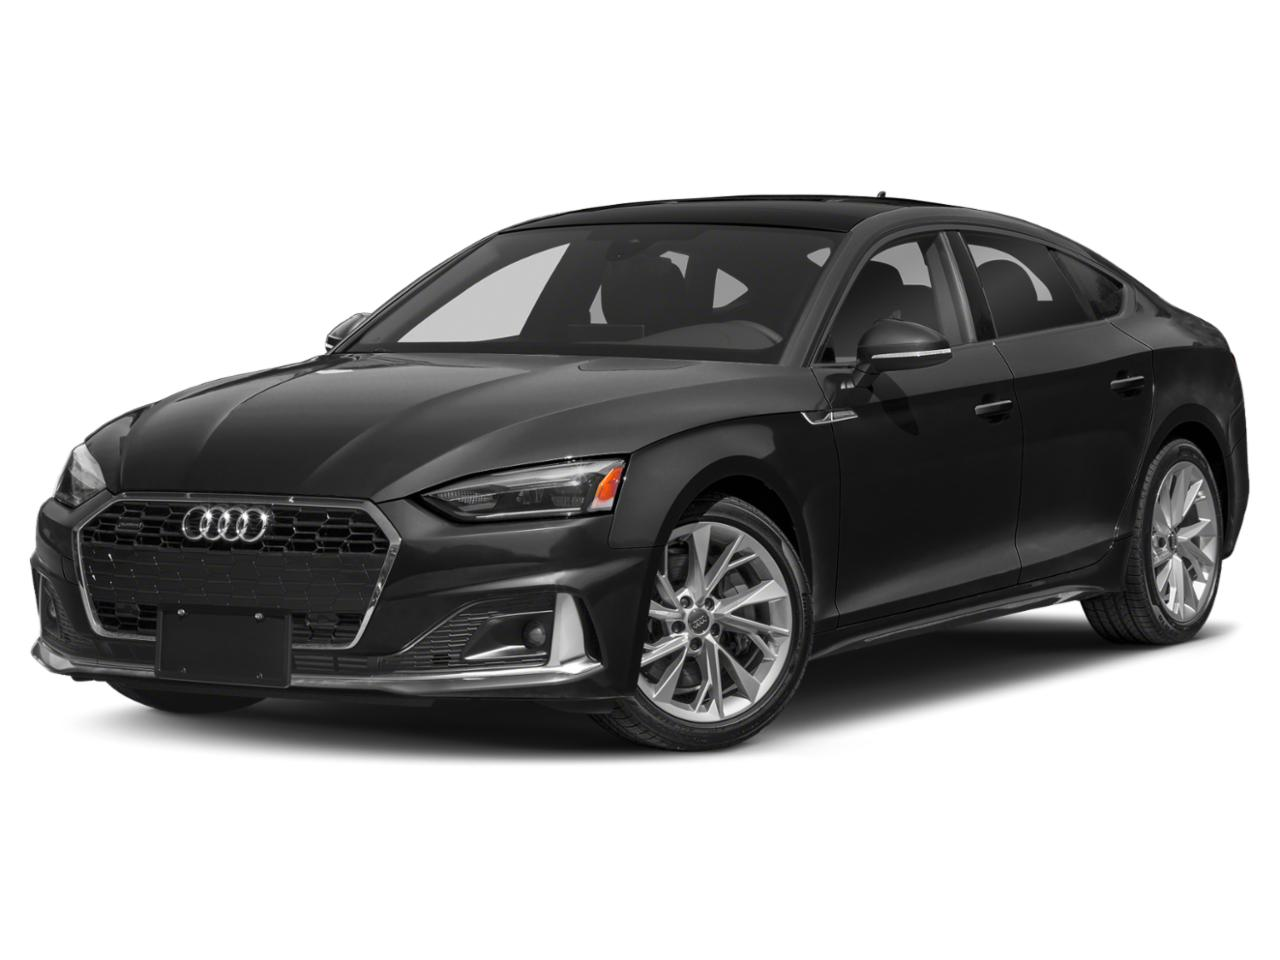 2022 Audi A5 Sportback Vehicle Photo in MCKINNEY, TX 75070